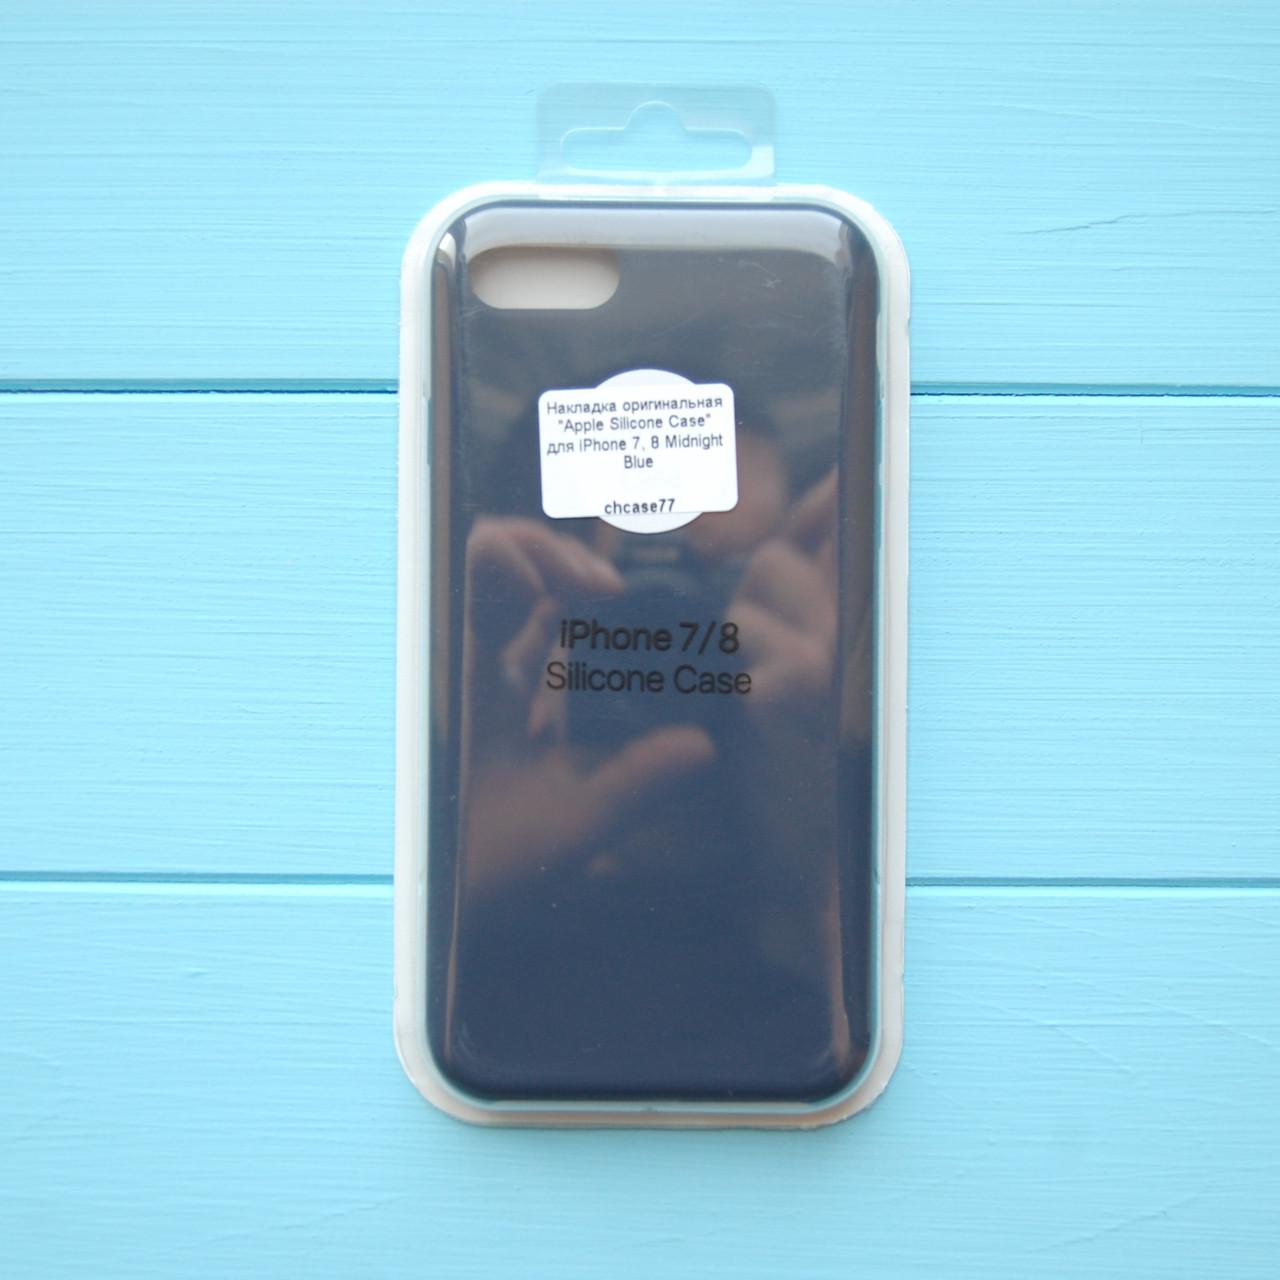 Накладка оригинальная Apple Silicone Case для iPhone 7, 8 Midnight Blue